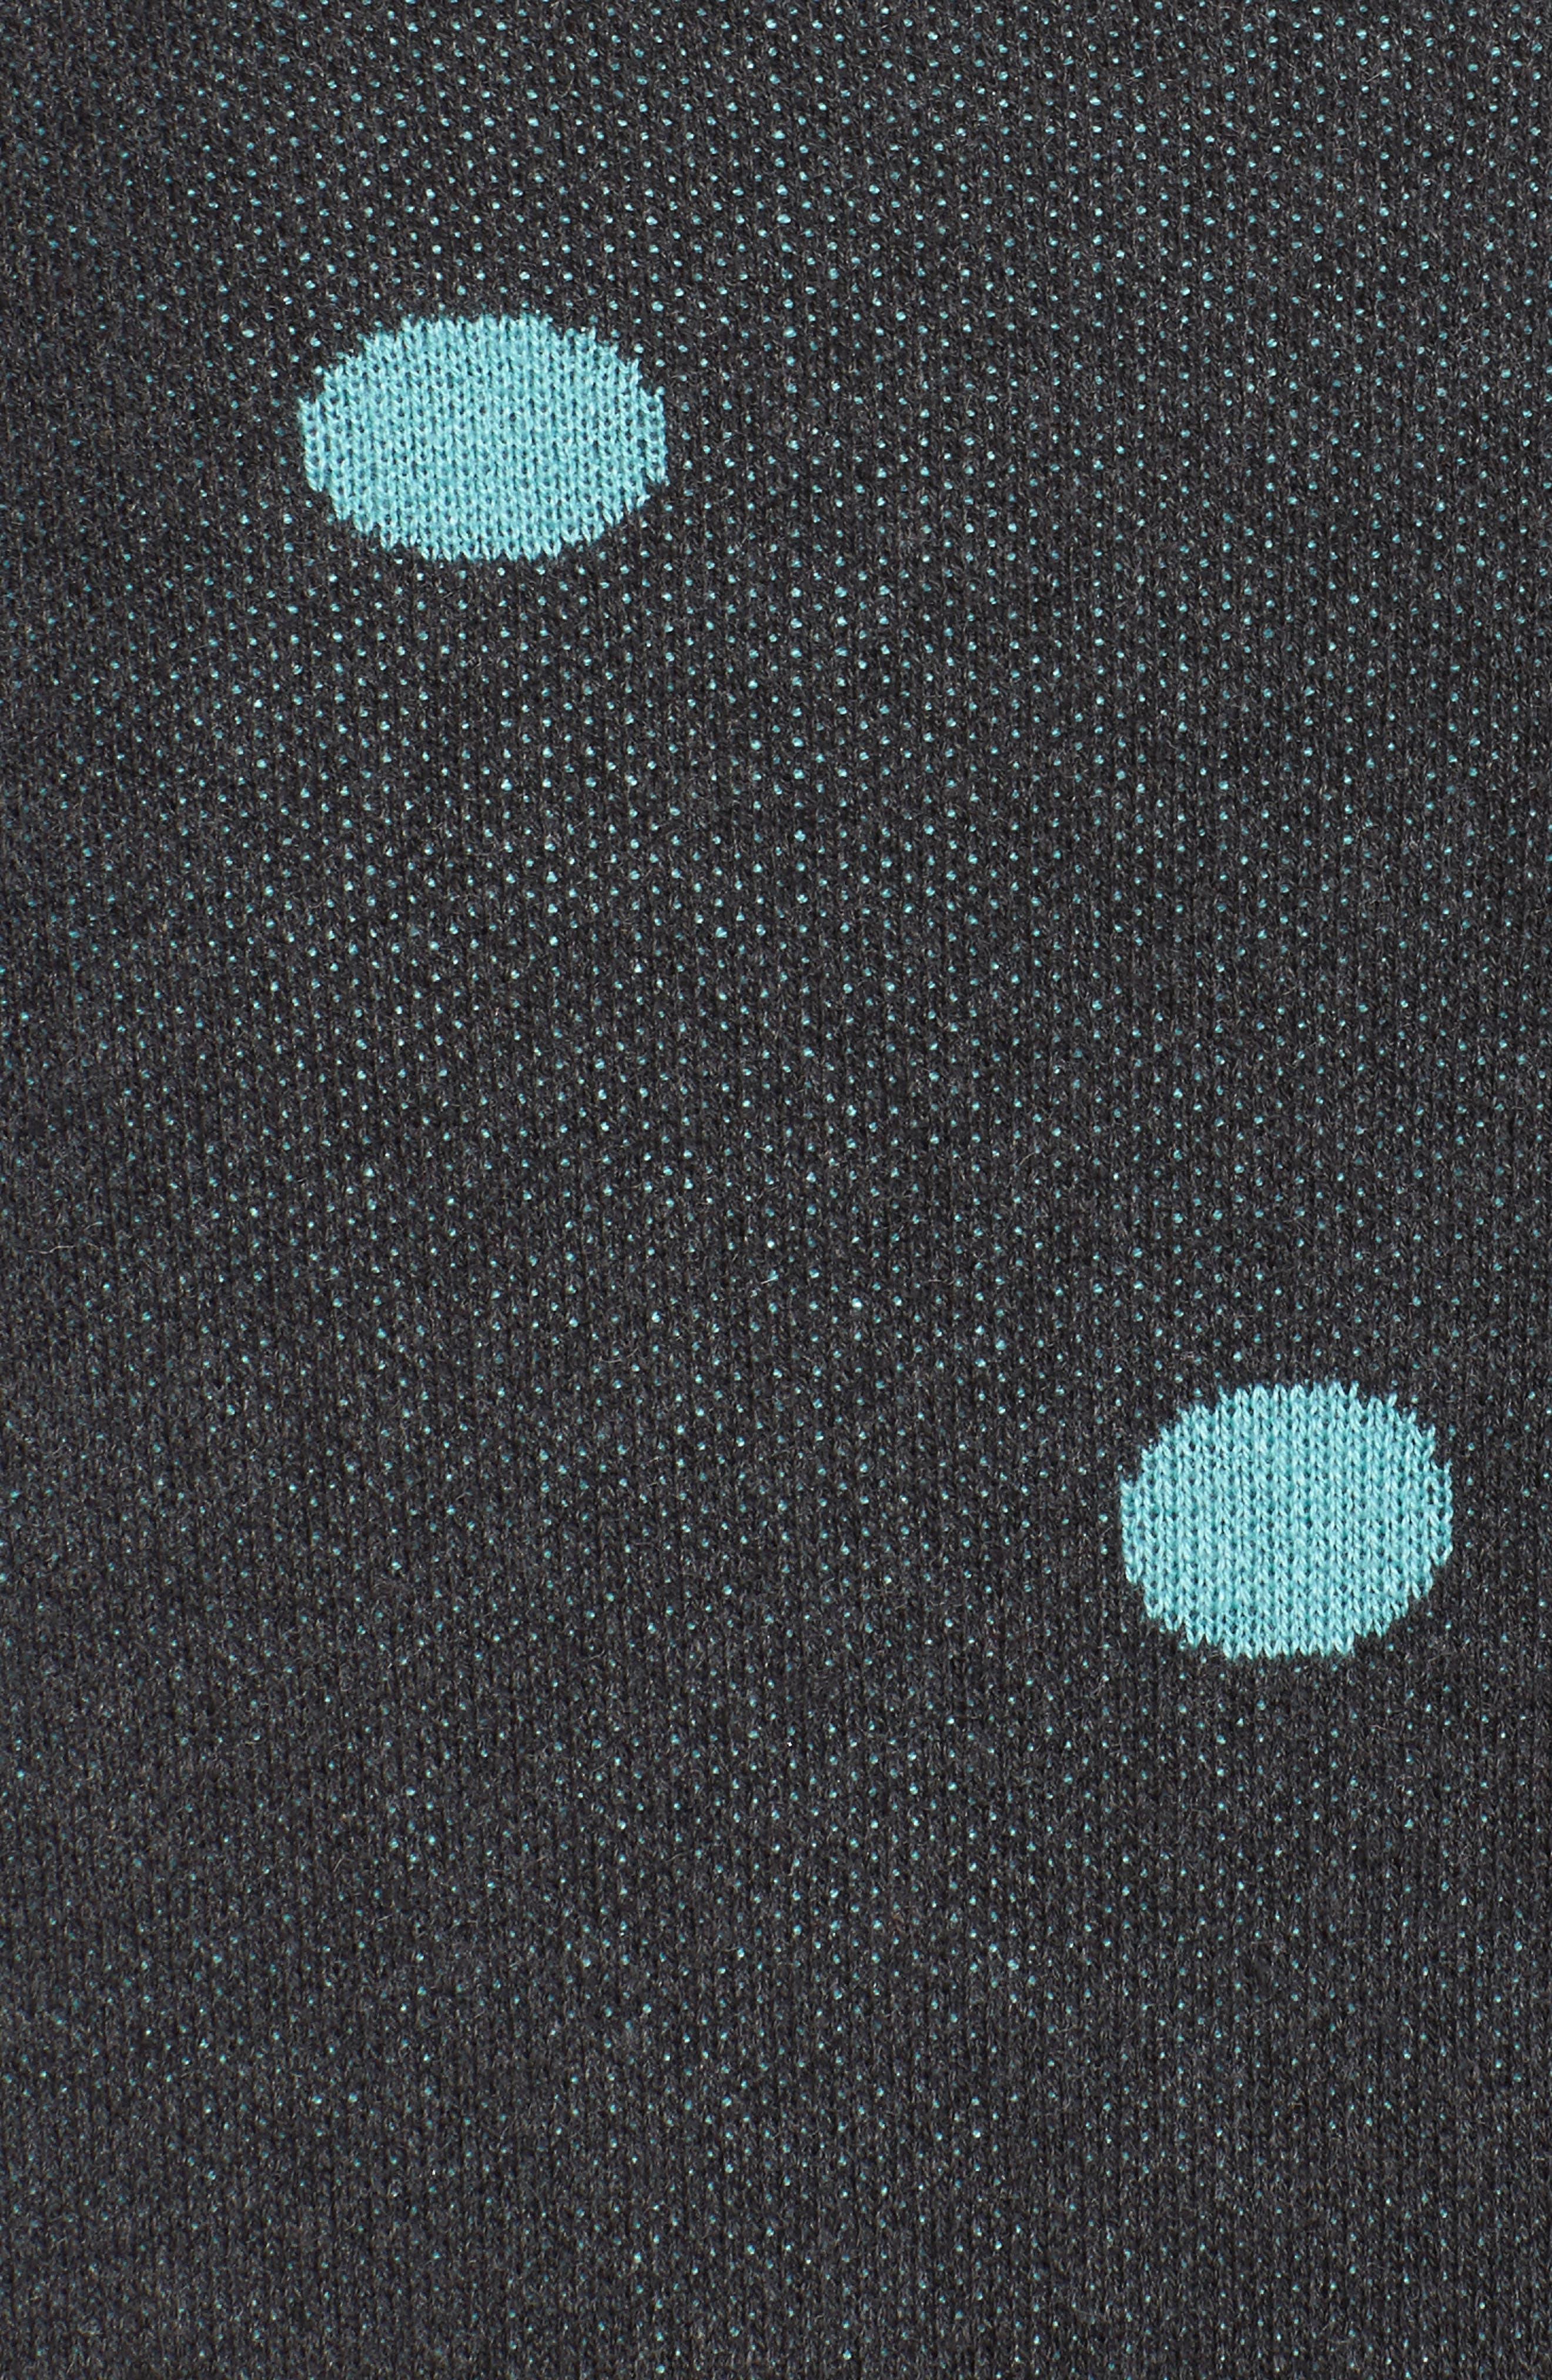 Dolman Sleeve Crewneck Sweater,                             Alternate thumbnail 23, color,